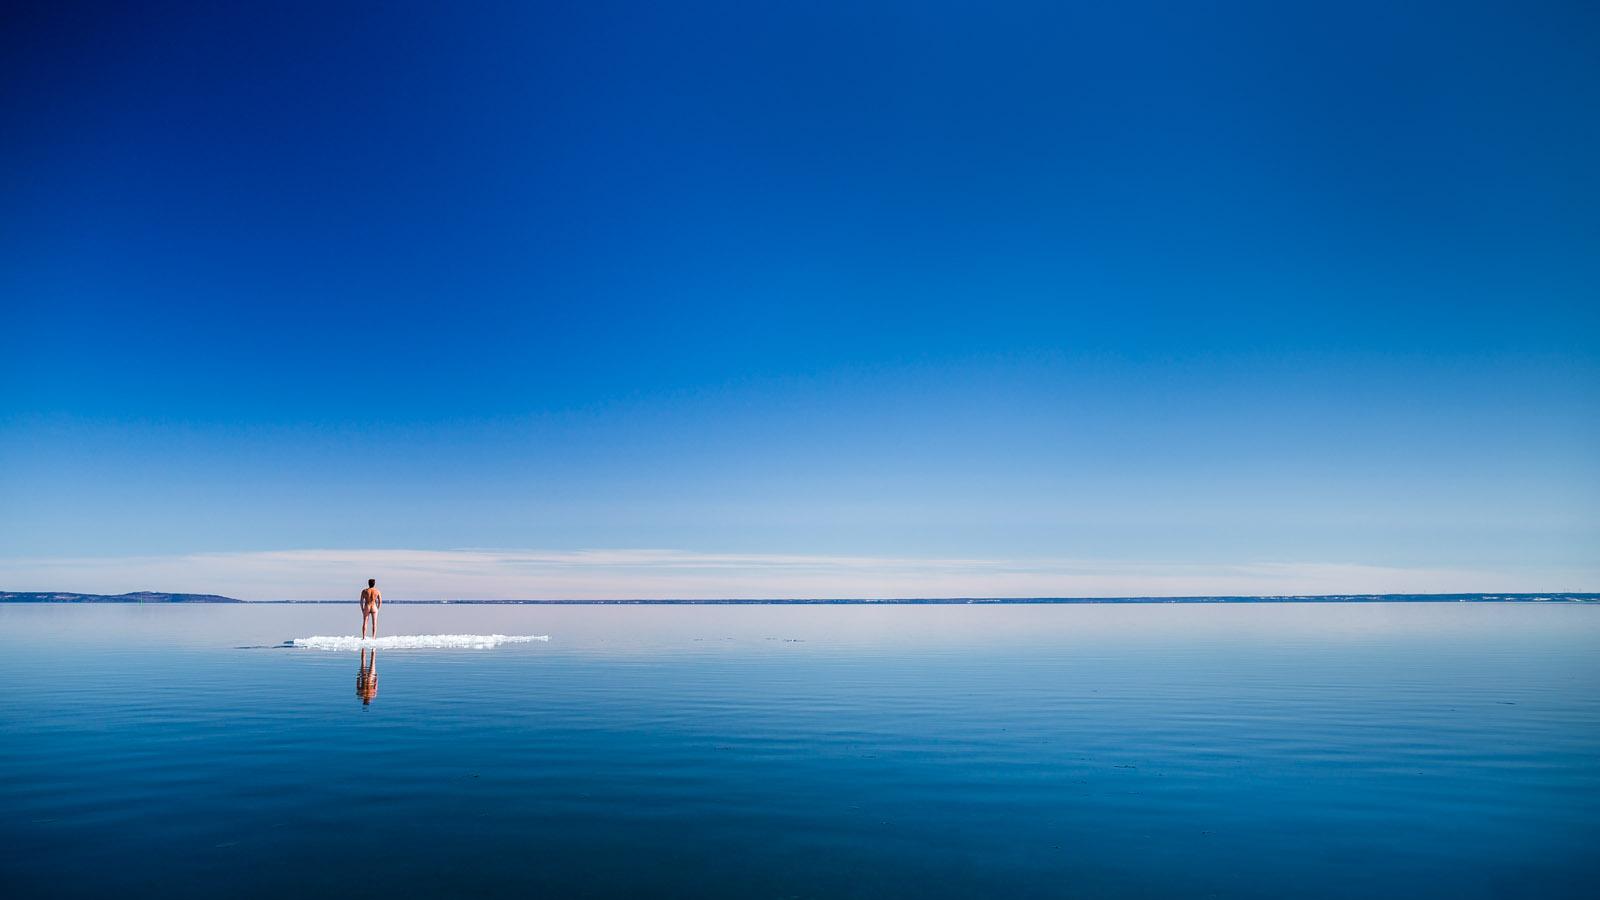 anhede destinationphotographer floe hjo ice icefloe is isflak landscapephotographer naken nude paddleboard standuppaddle sup sverige sweden travelphotographer vättern vinter winter